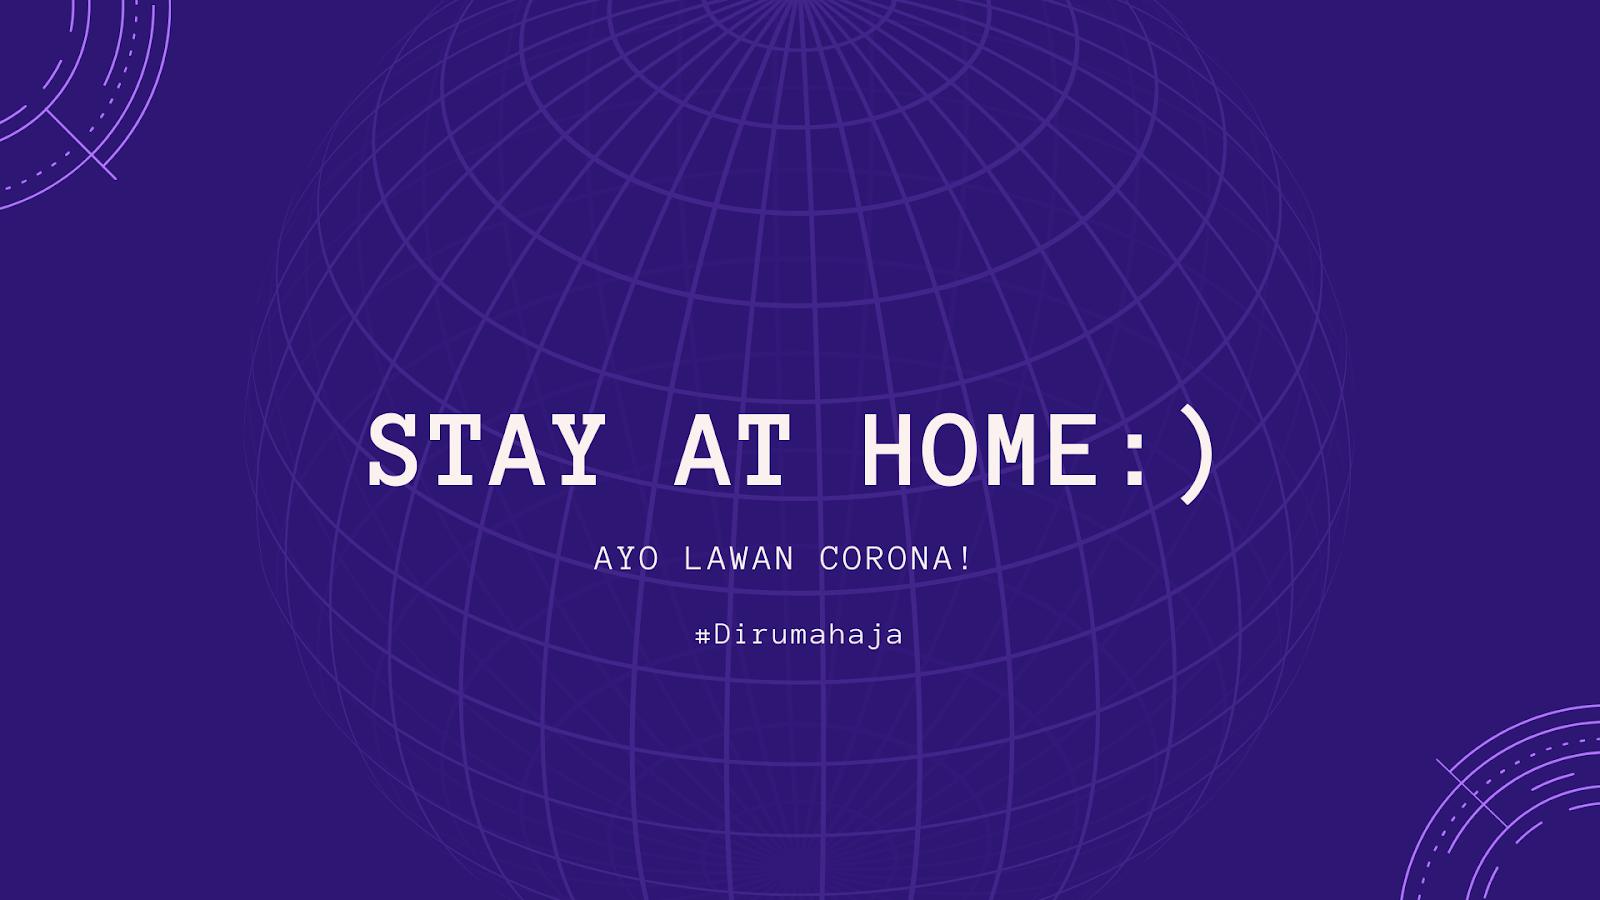 Stay At Home, Ayo Lawan Corona! #Dirumahaja